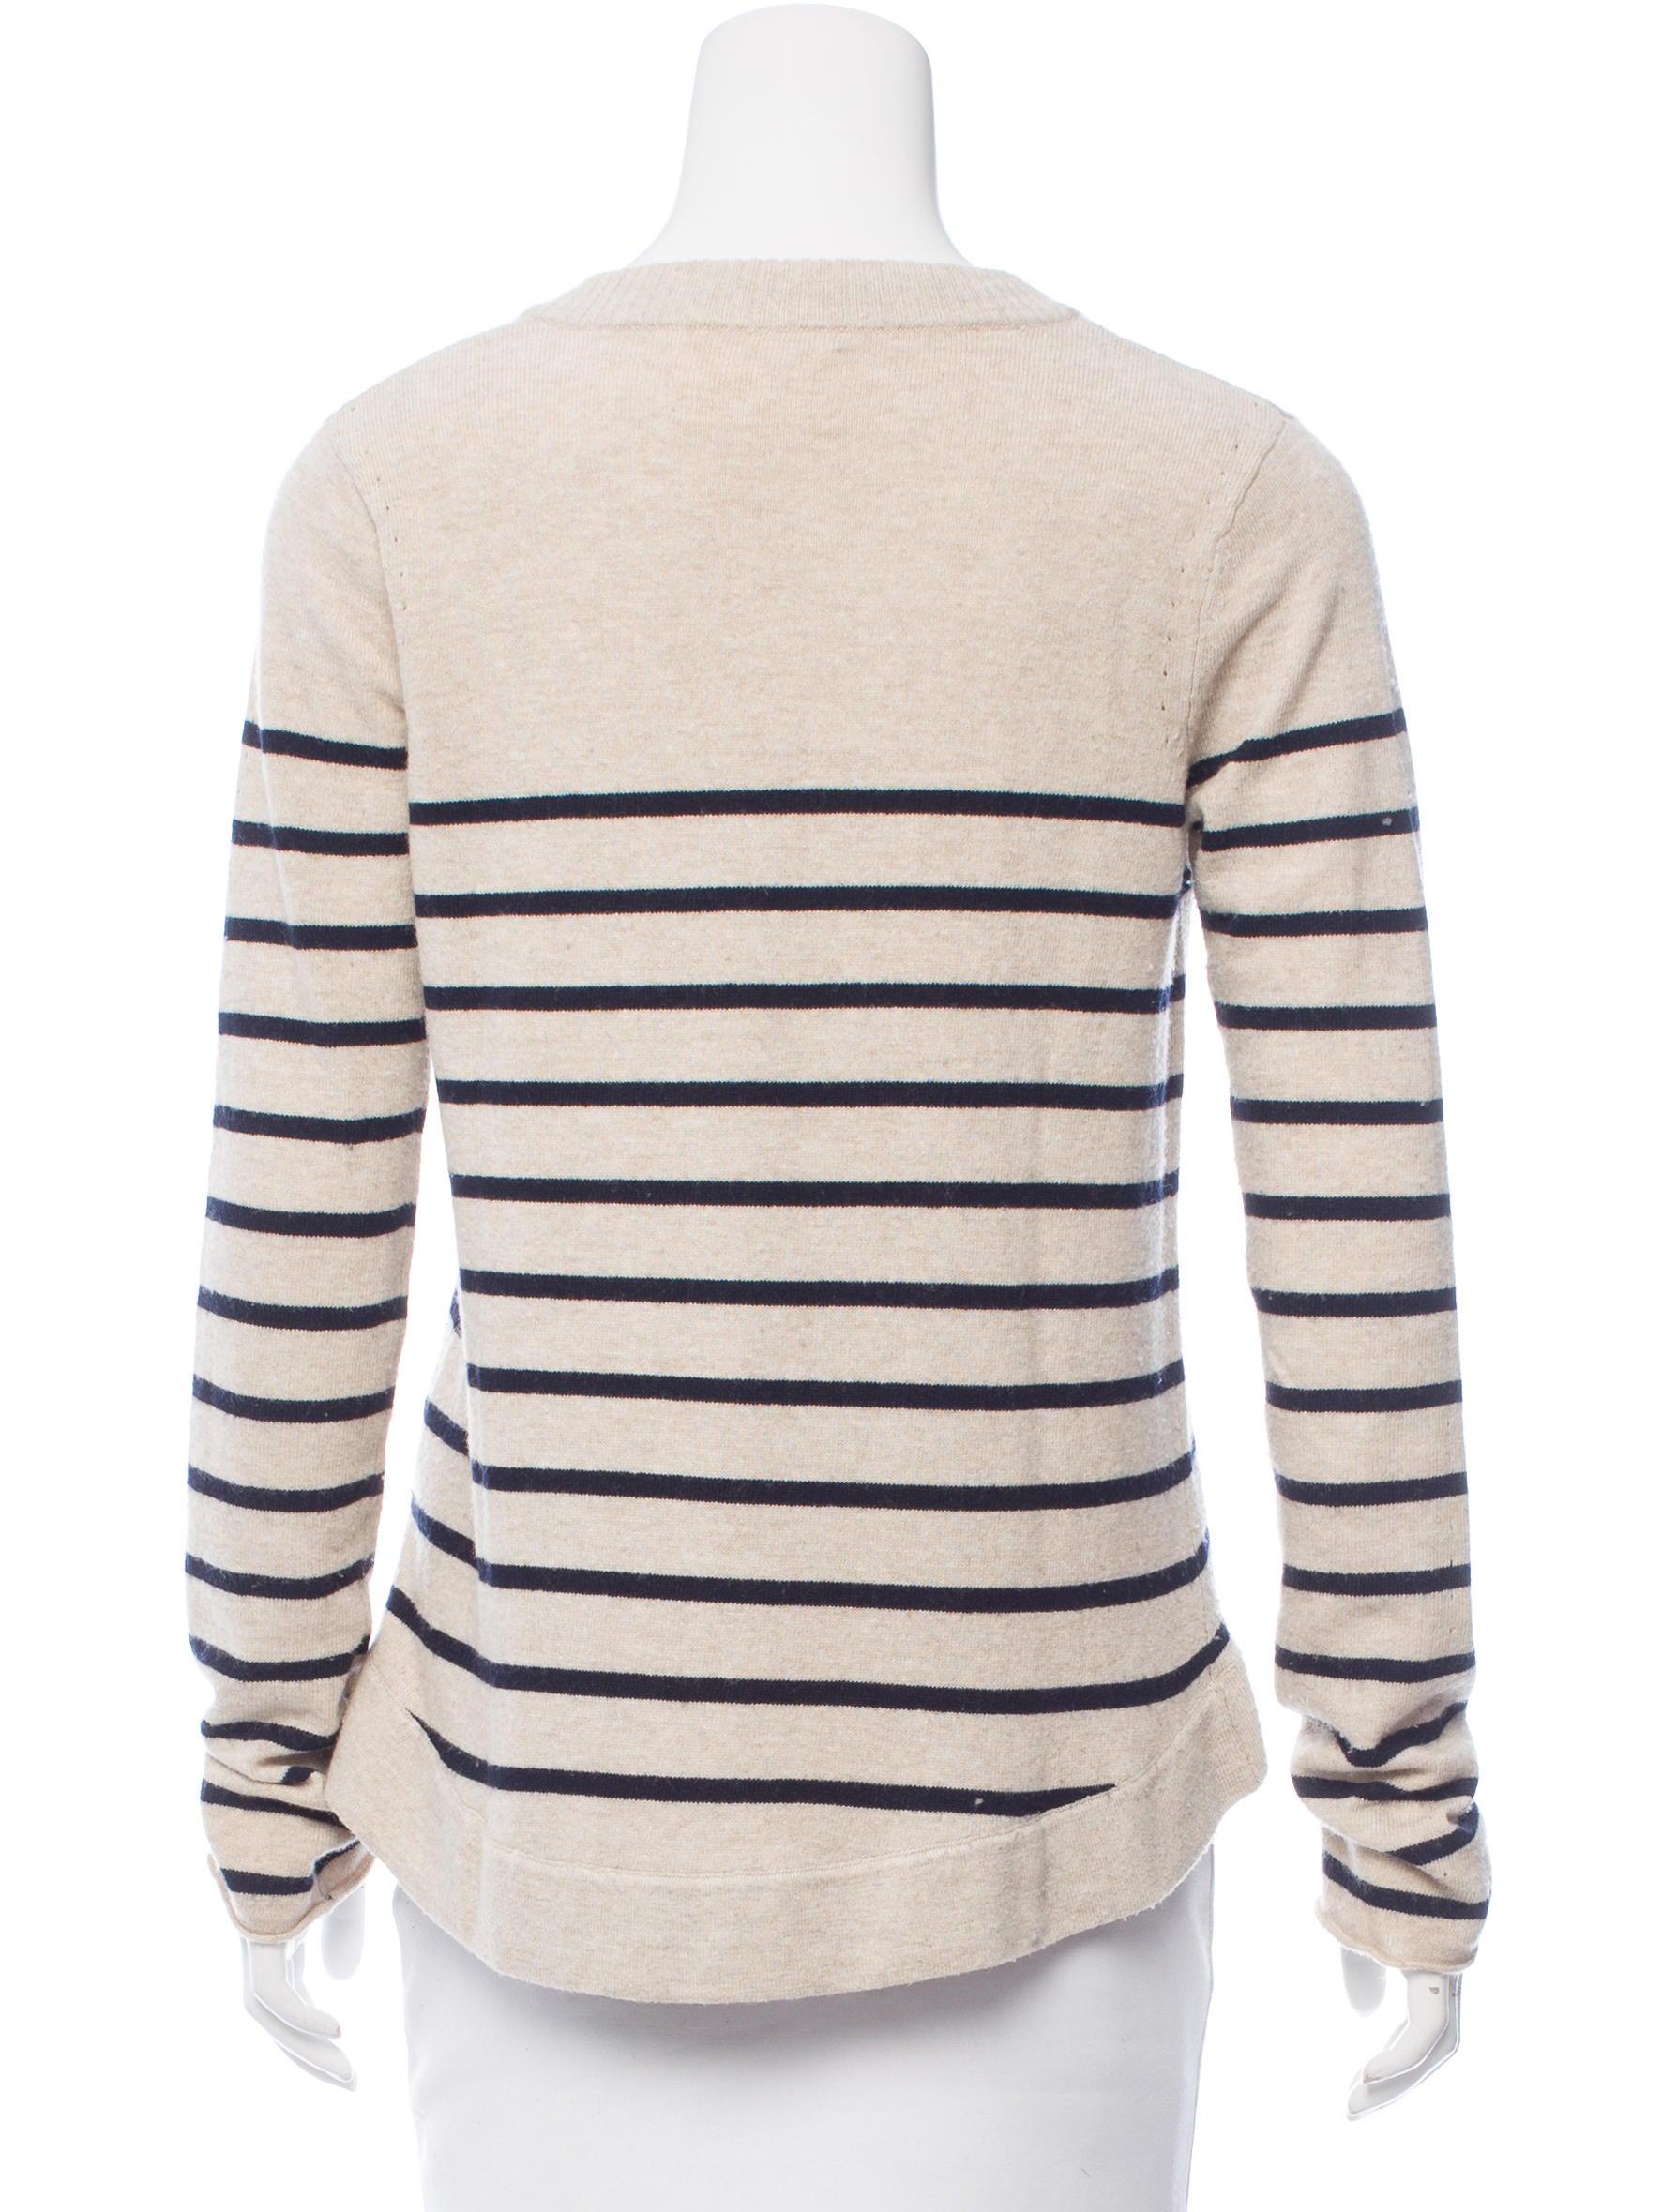 Rag & Bone Stripe Pattern Knit Sweater - Clothing ...